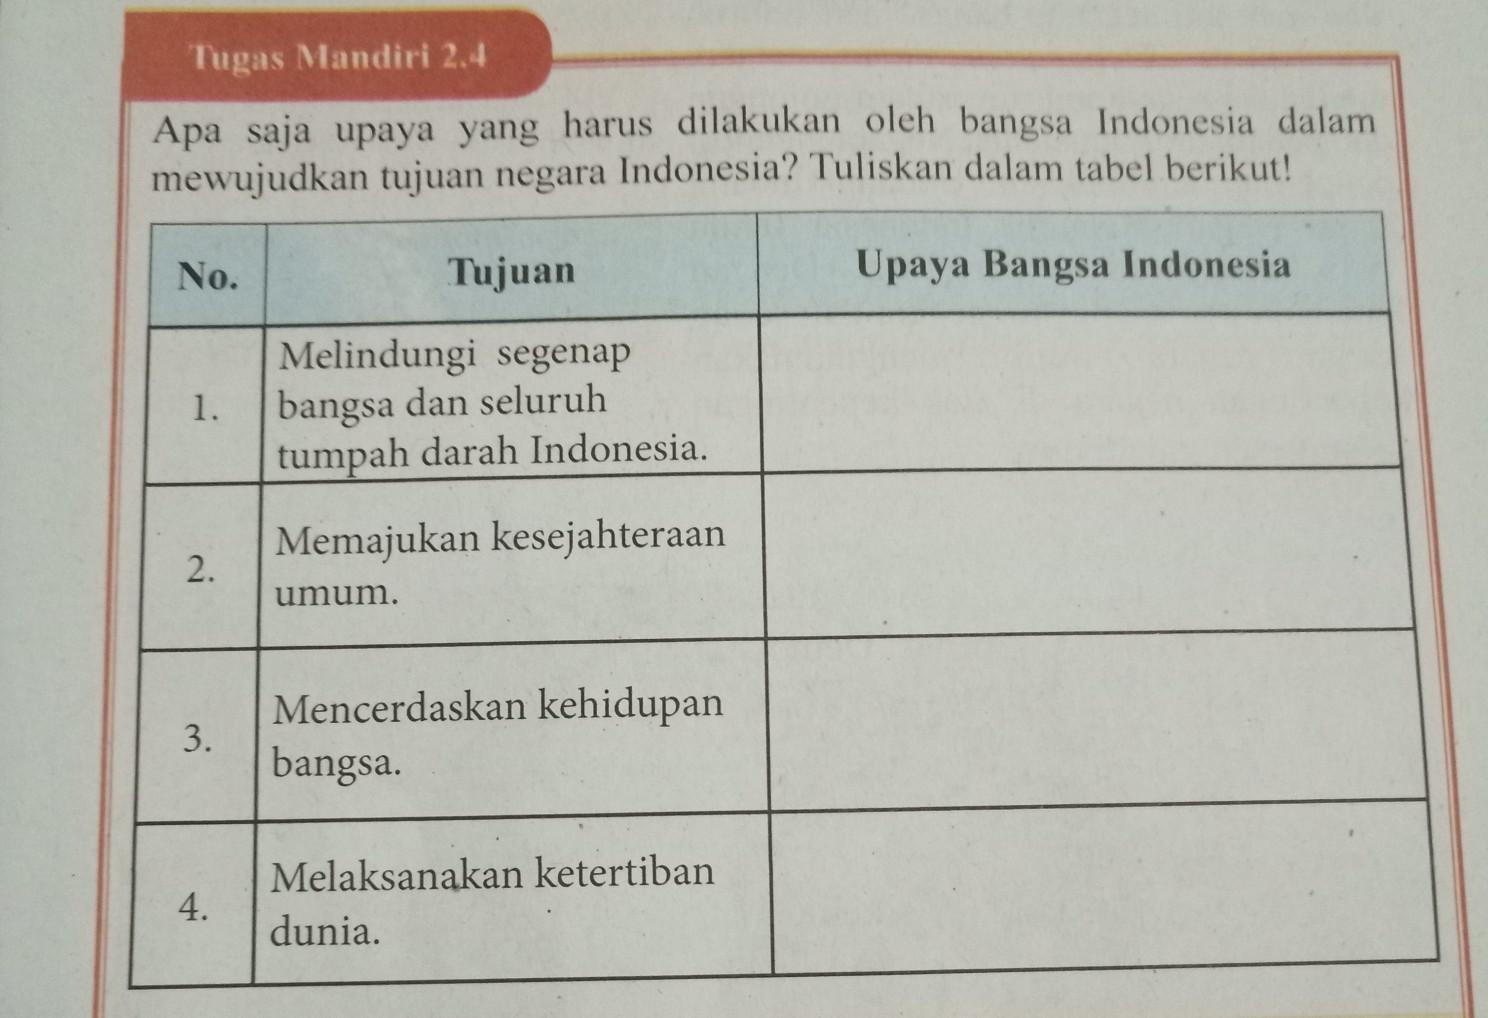 Tugas Mandiri 2 4 Halaman 39 Kelas 9 Brainly Co Id